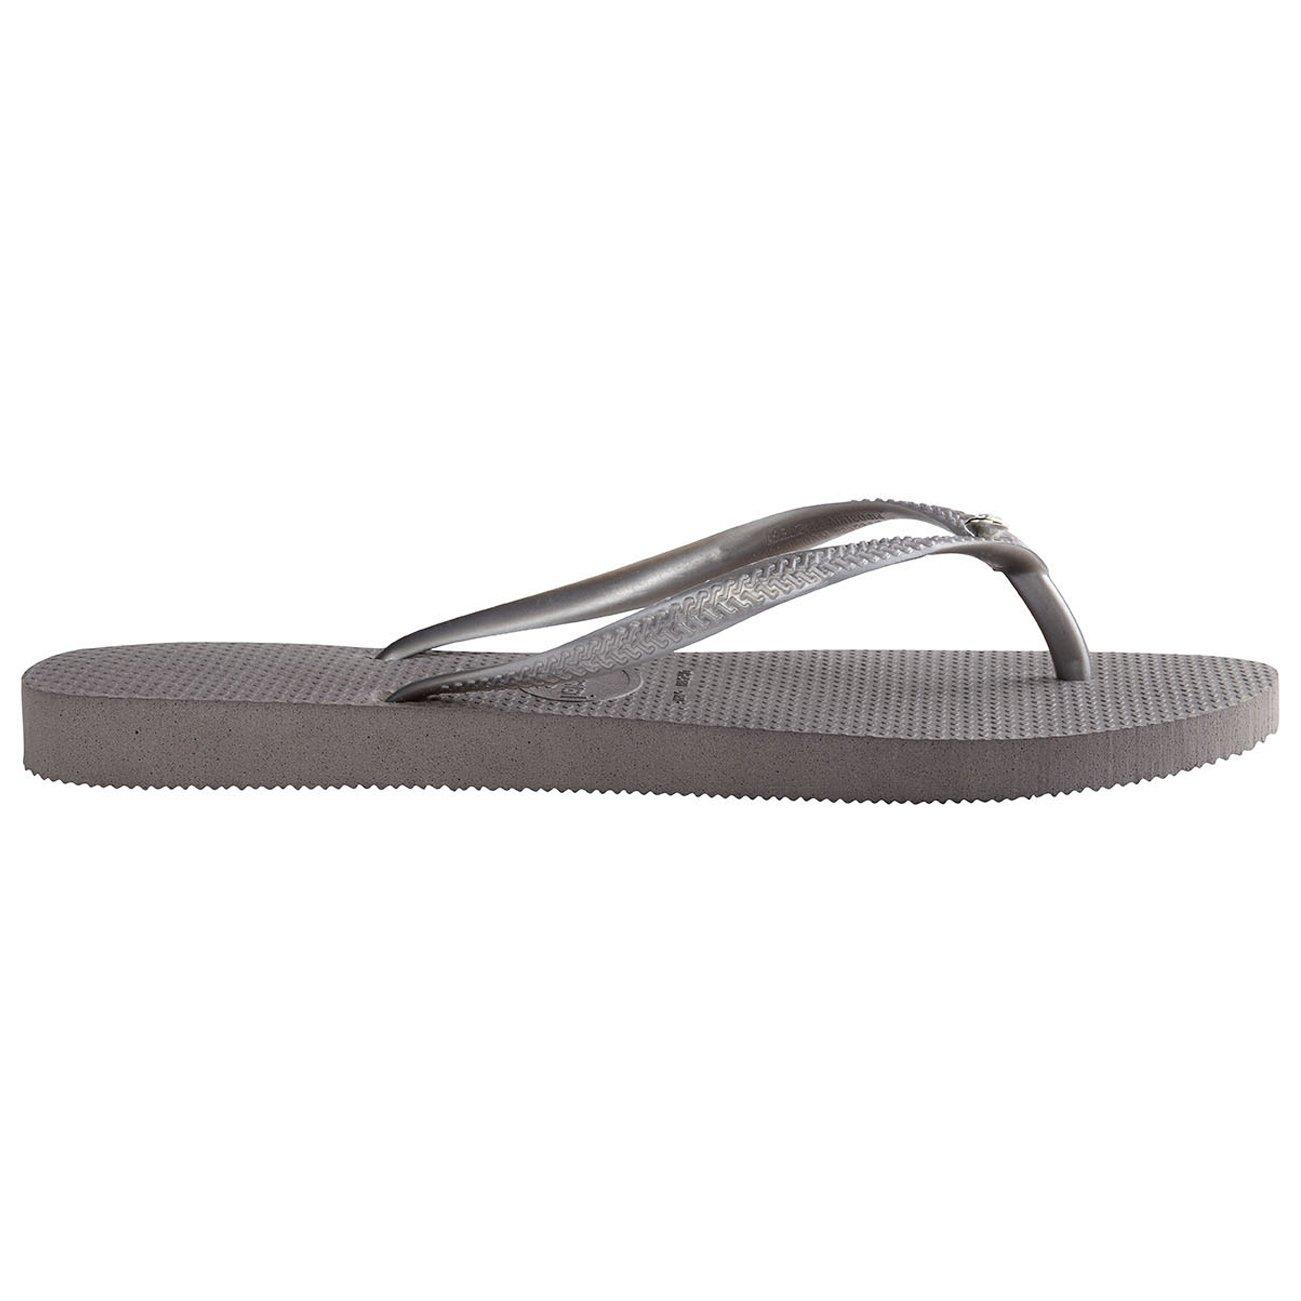 7923d9dca3f26 Womens Havaianas Slim Crystal Glamour Sw Thongs Rubber Diamond Flip Flop   Amazon.ca  Shoes   Handbags